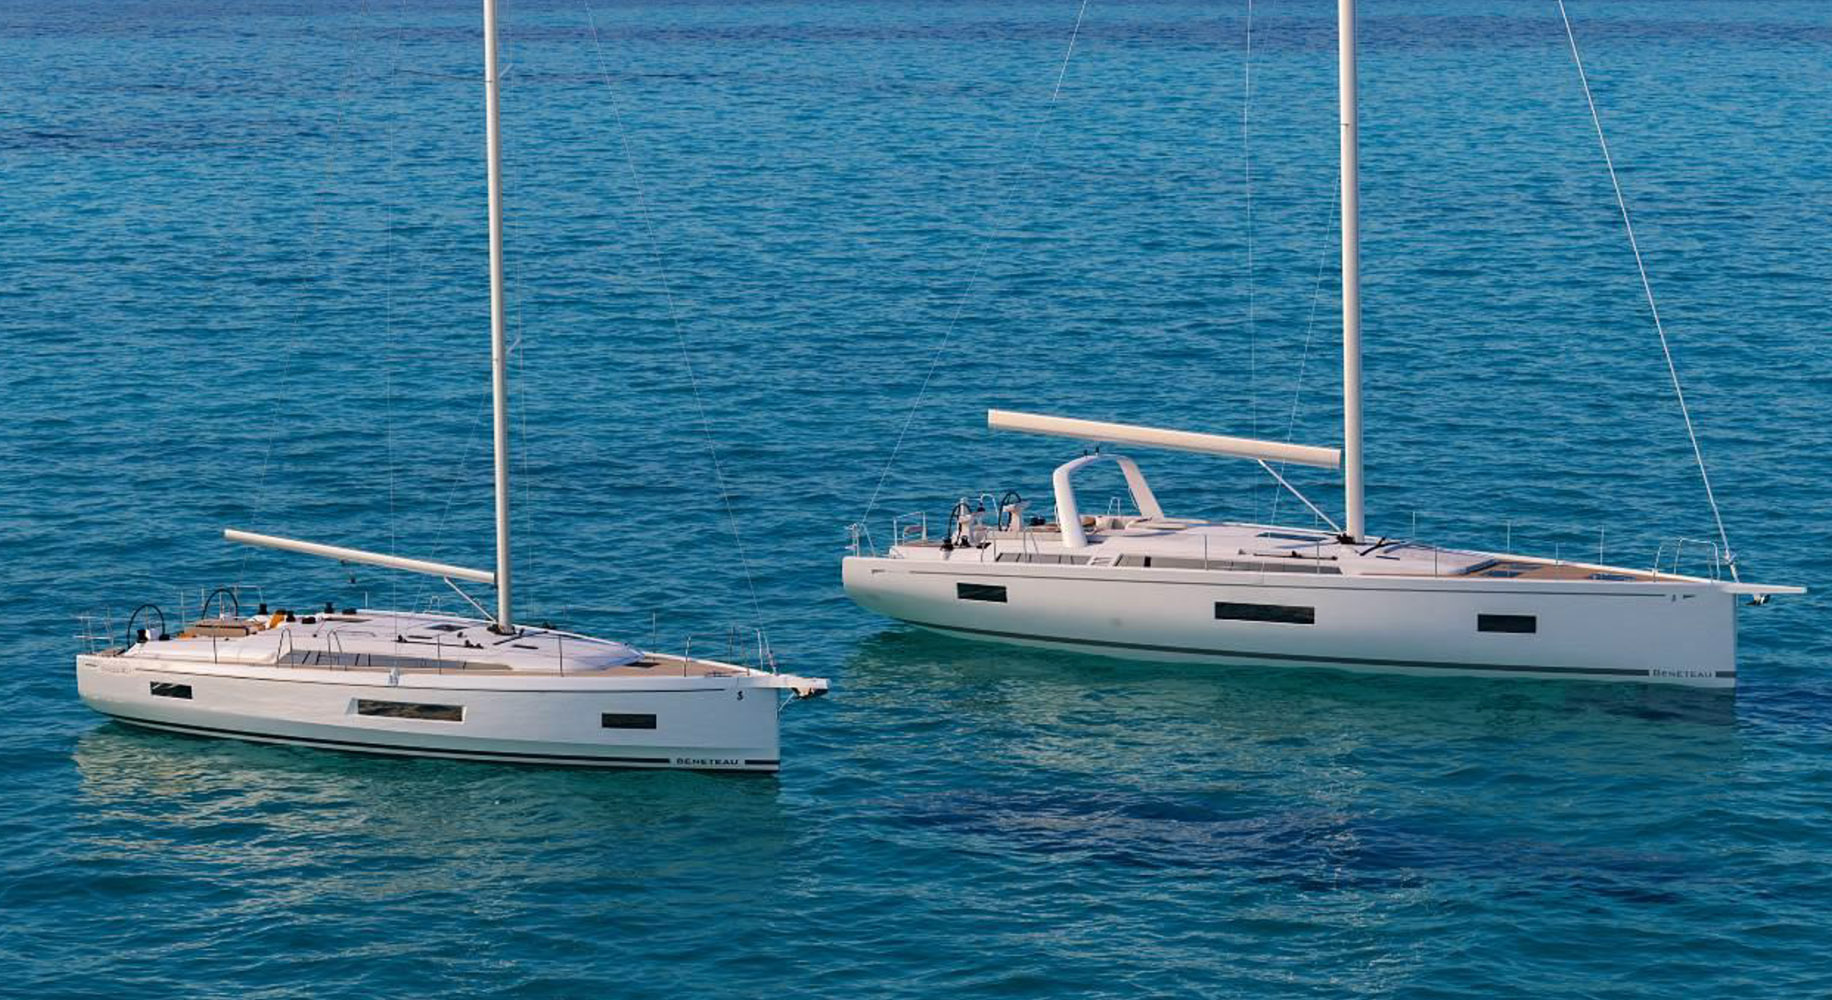 NEW OCEANIS YACHT 54 & OCEANIS 40.1